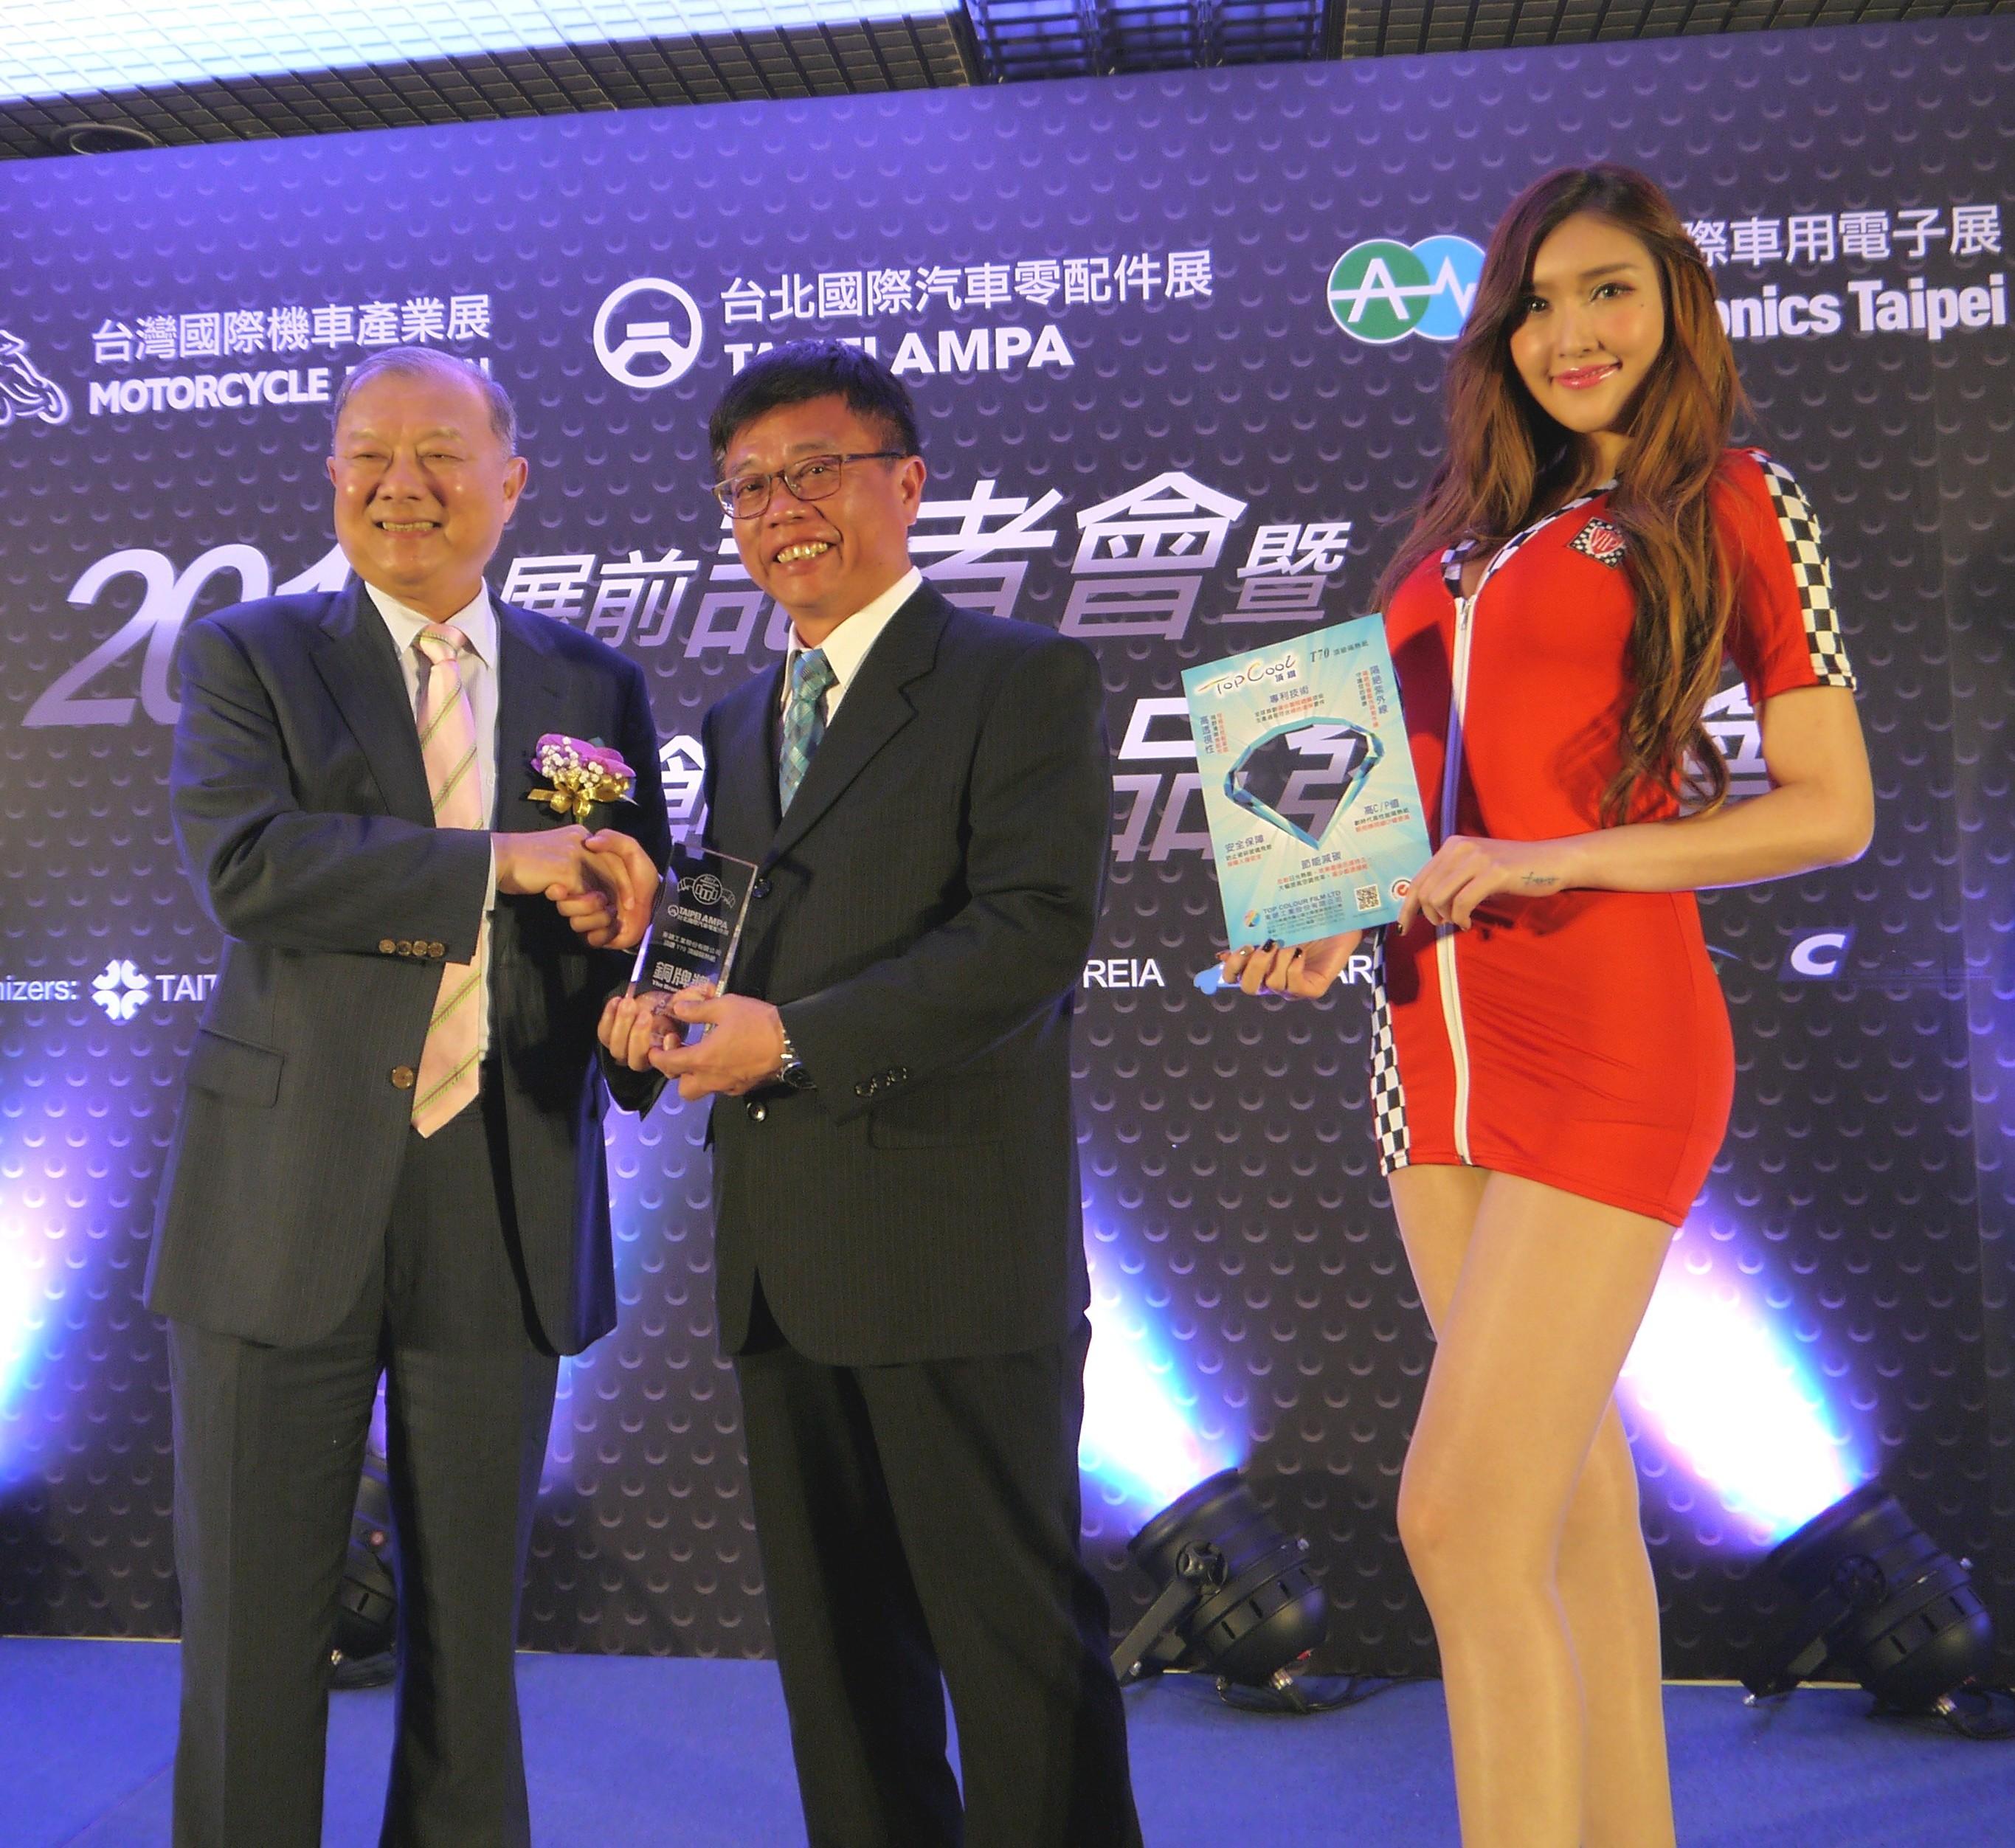 TopCool T70 отлично оконная пленка Лауреат премии Taipei AMPA за инновации 2018 года!